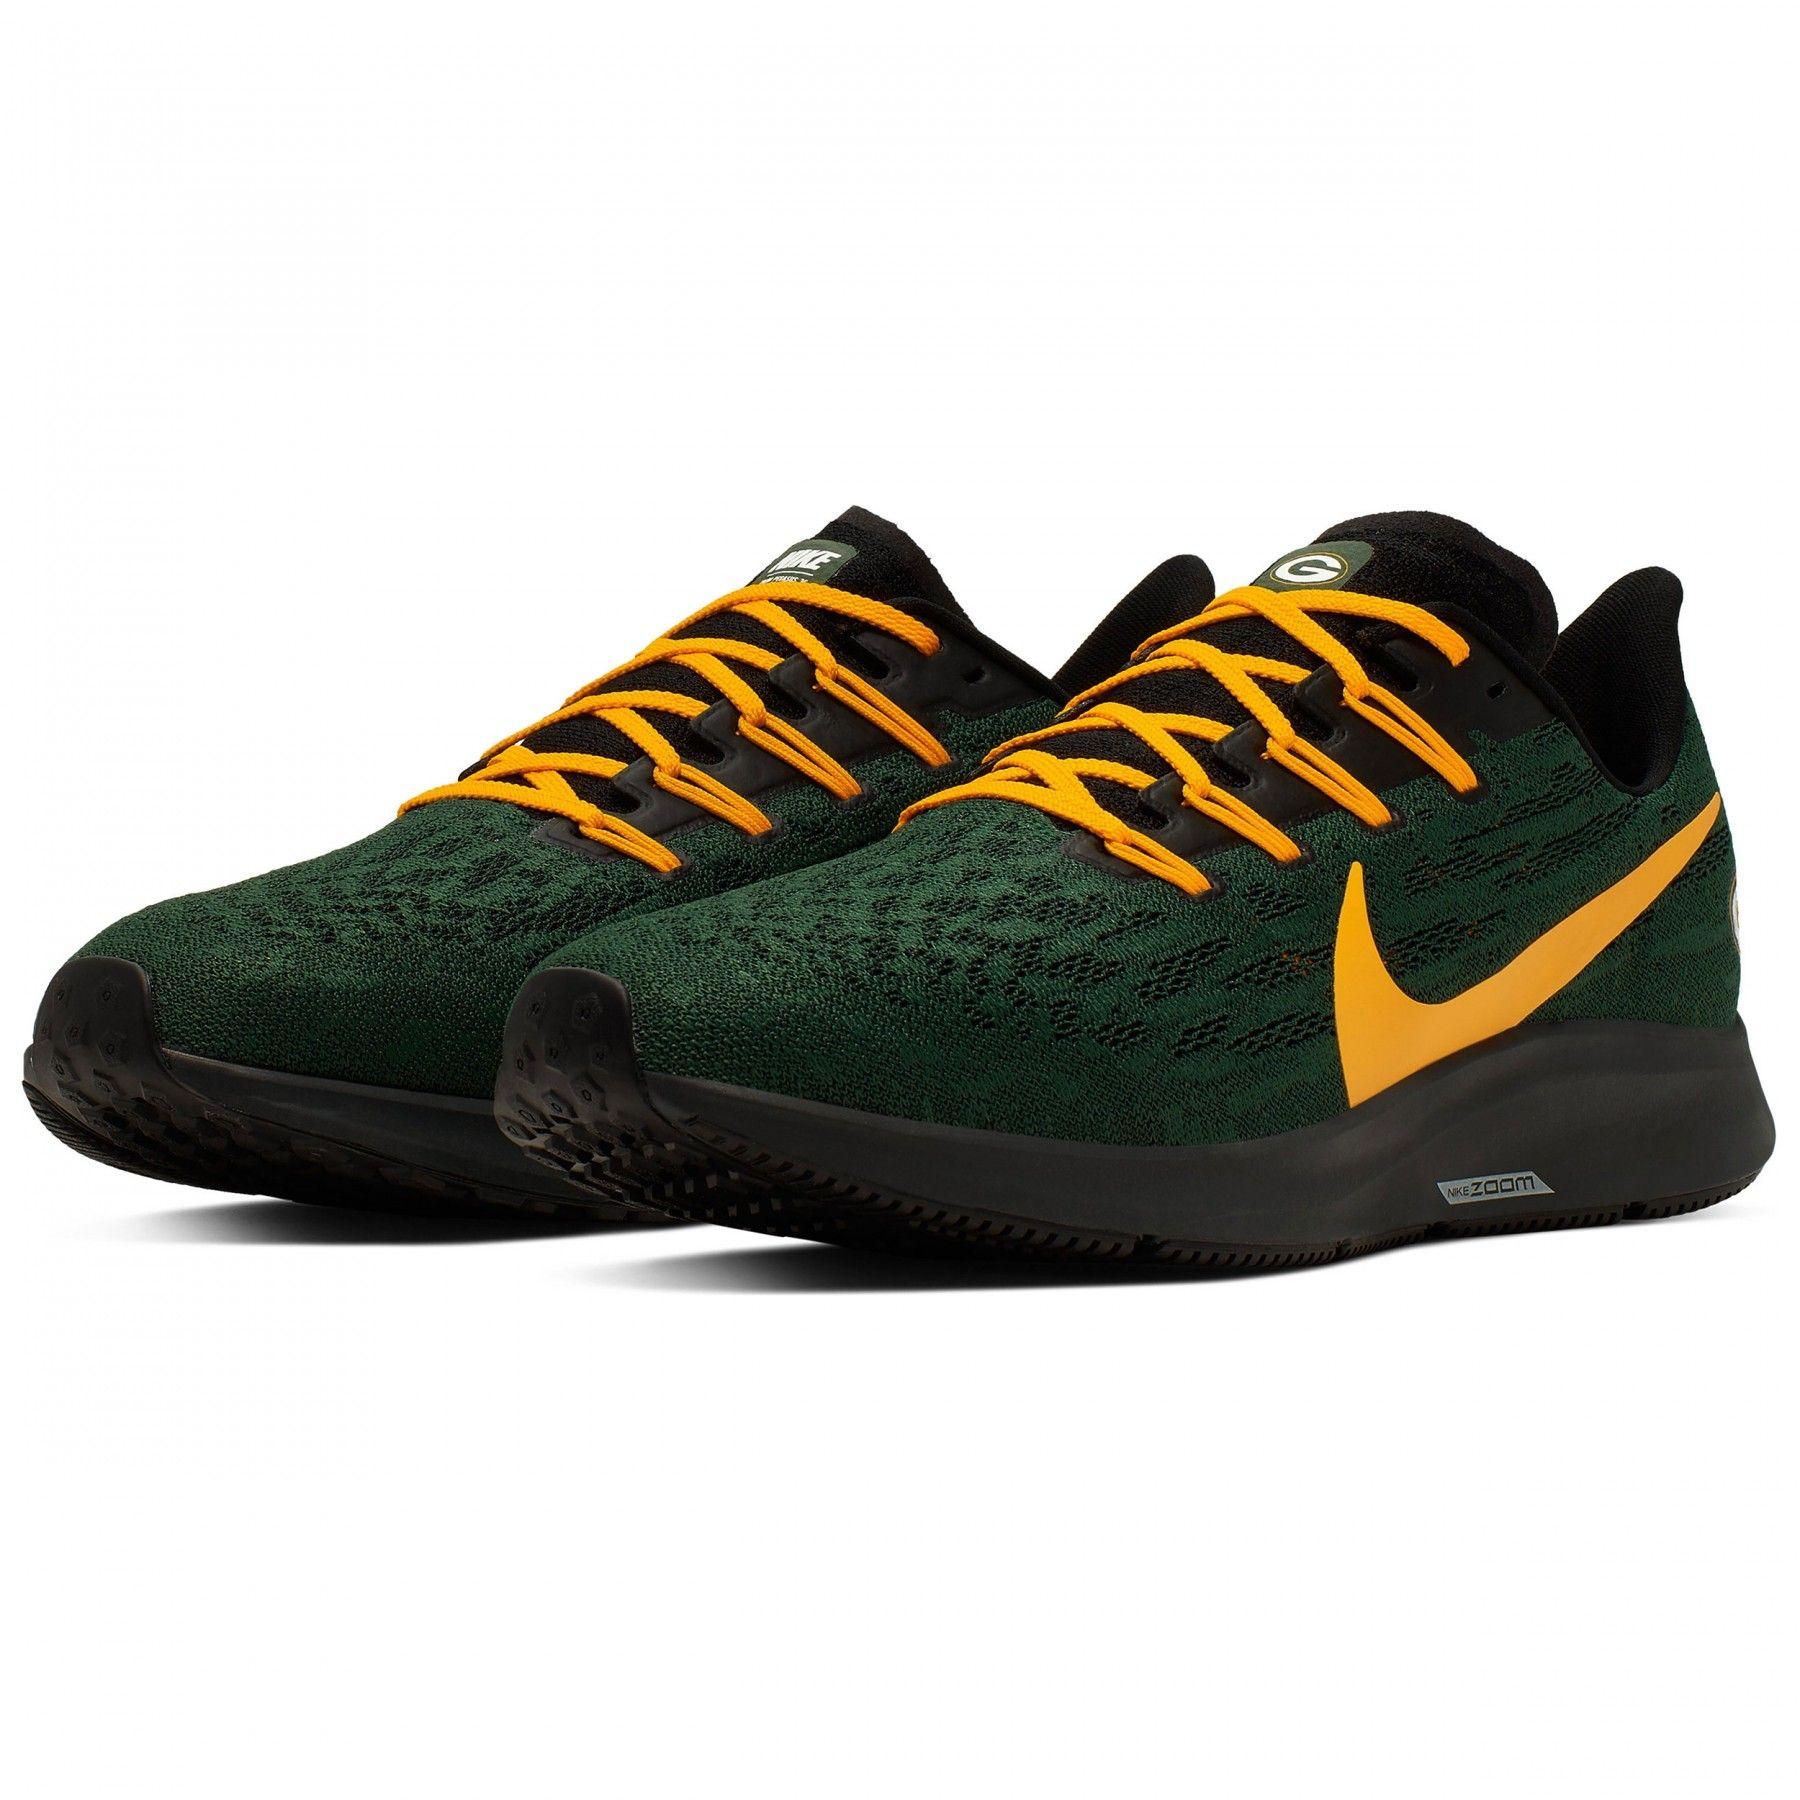 Packers Nike Air Zoom Pegasus 36 Shoe Green Bay Packers Shoes Nike Air Zoom Pegasus Nike Air Zoom